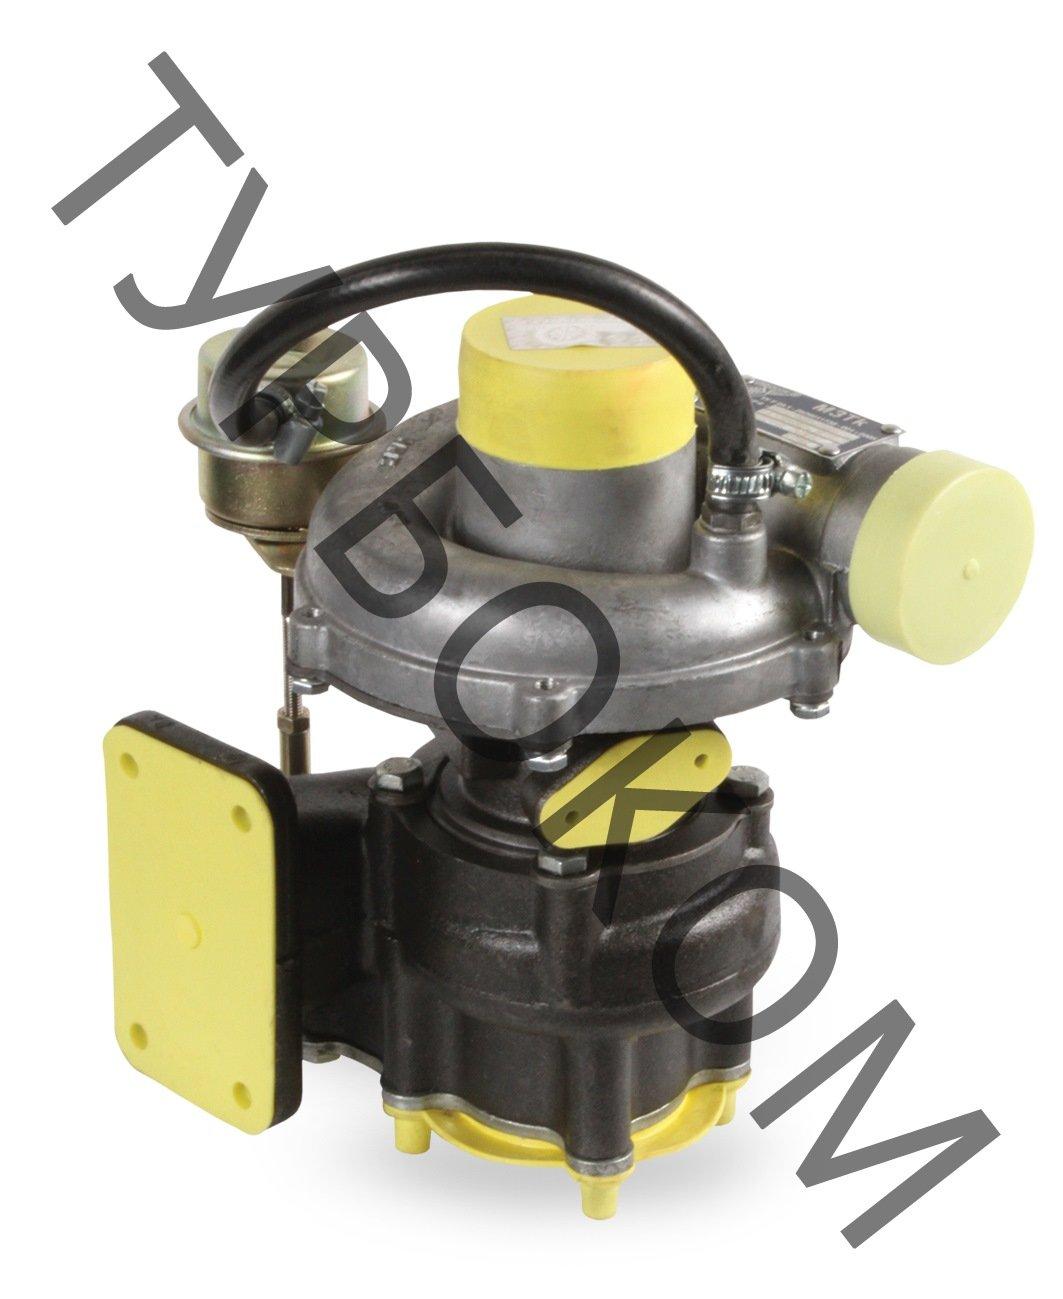 Турбокомпрессор ТКР-6.1 с клапаном